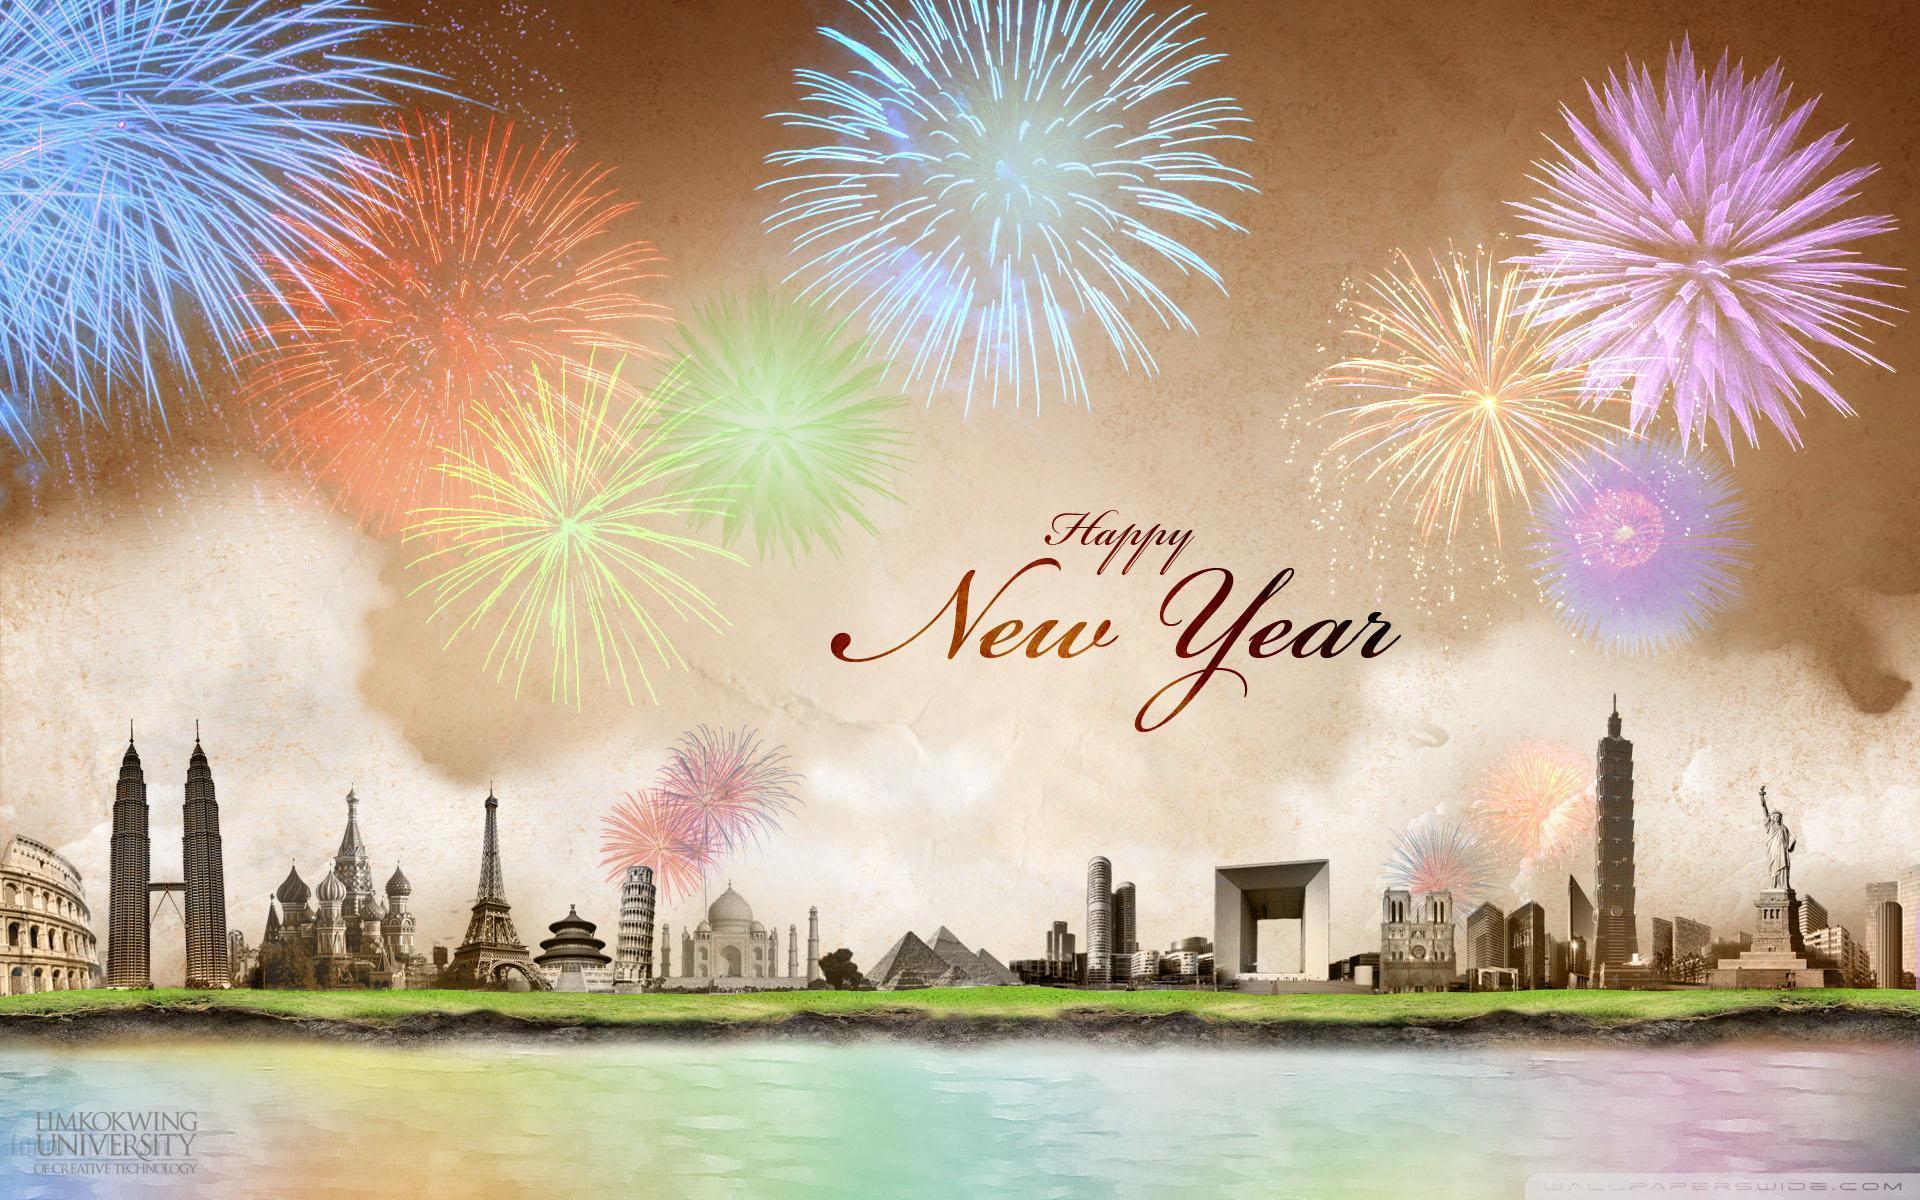 Happy new year wallpaper download | Zem Wallpaper Is The Best ...